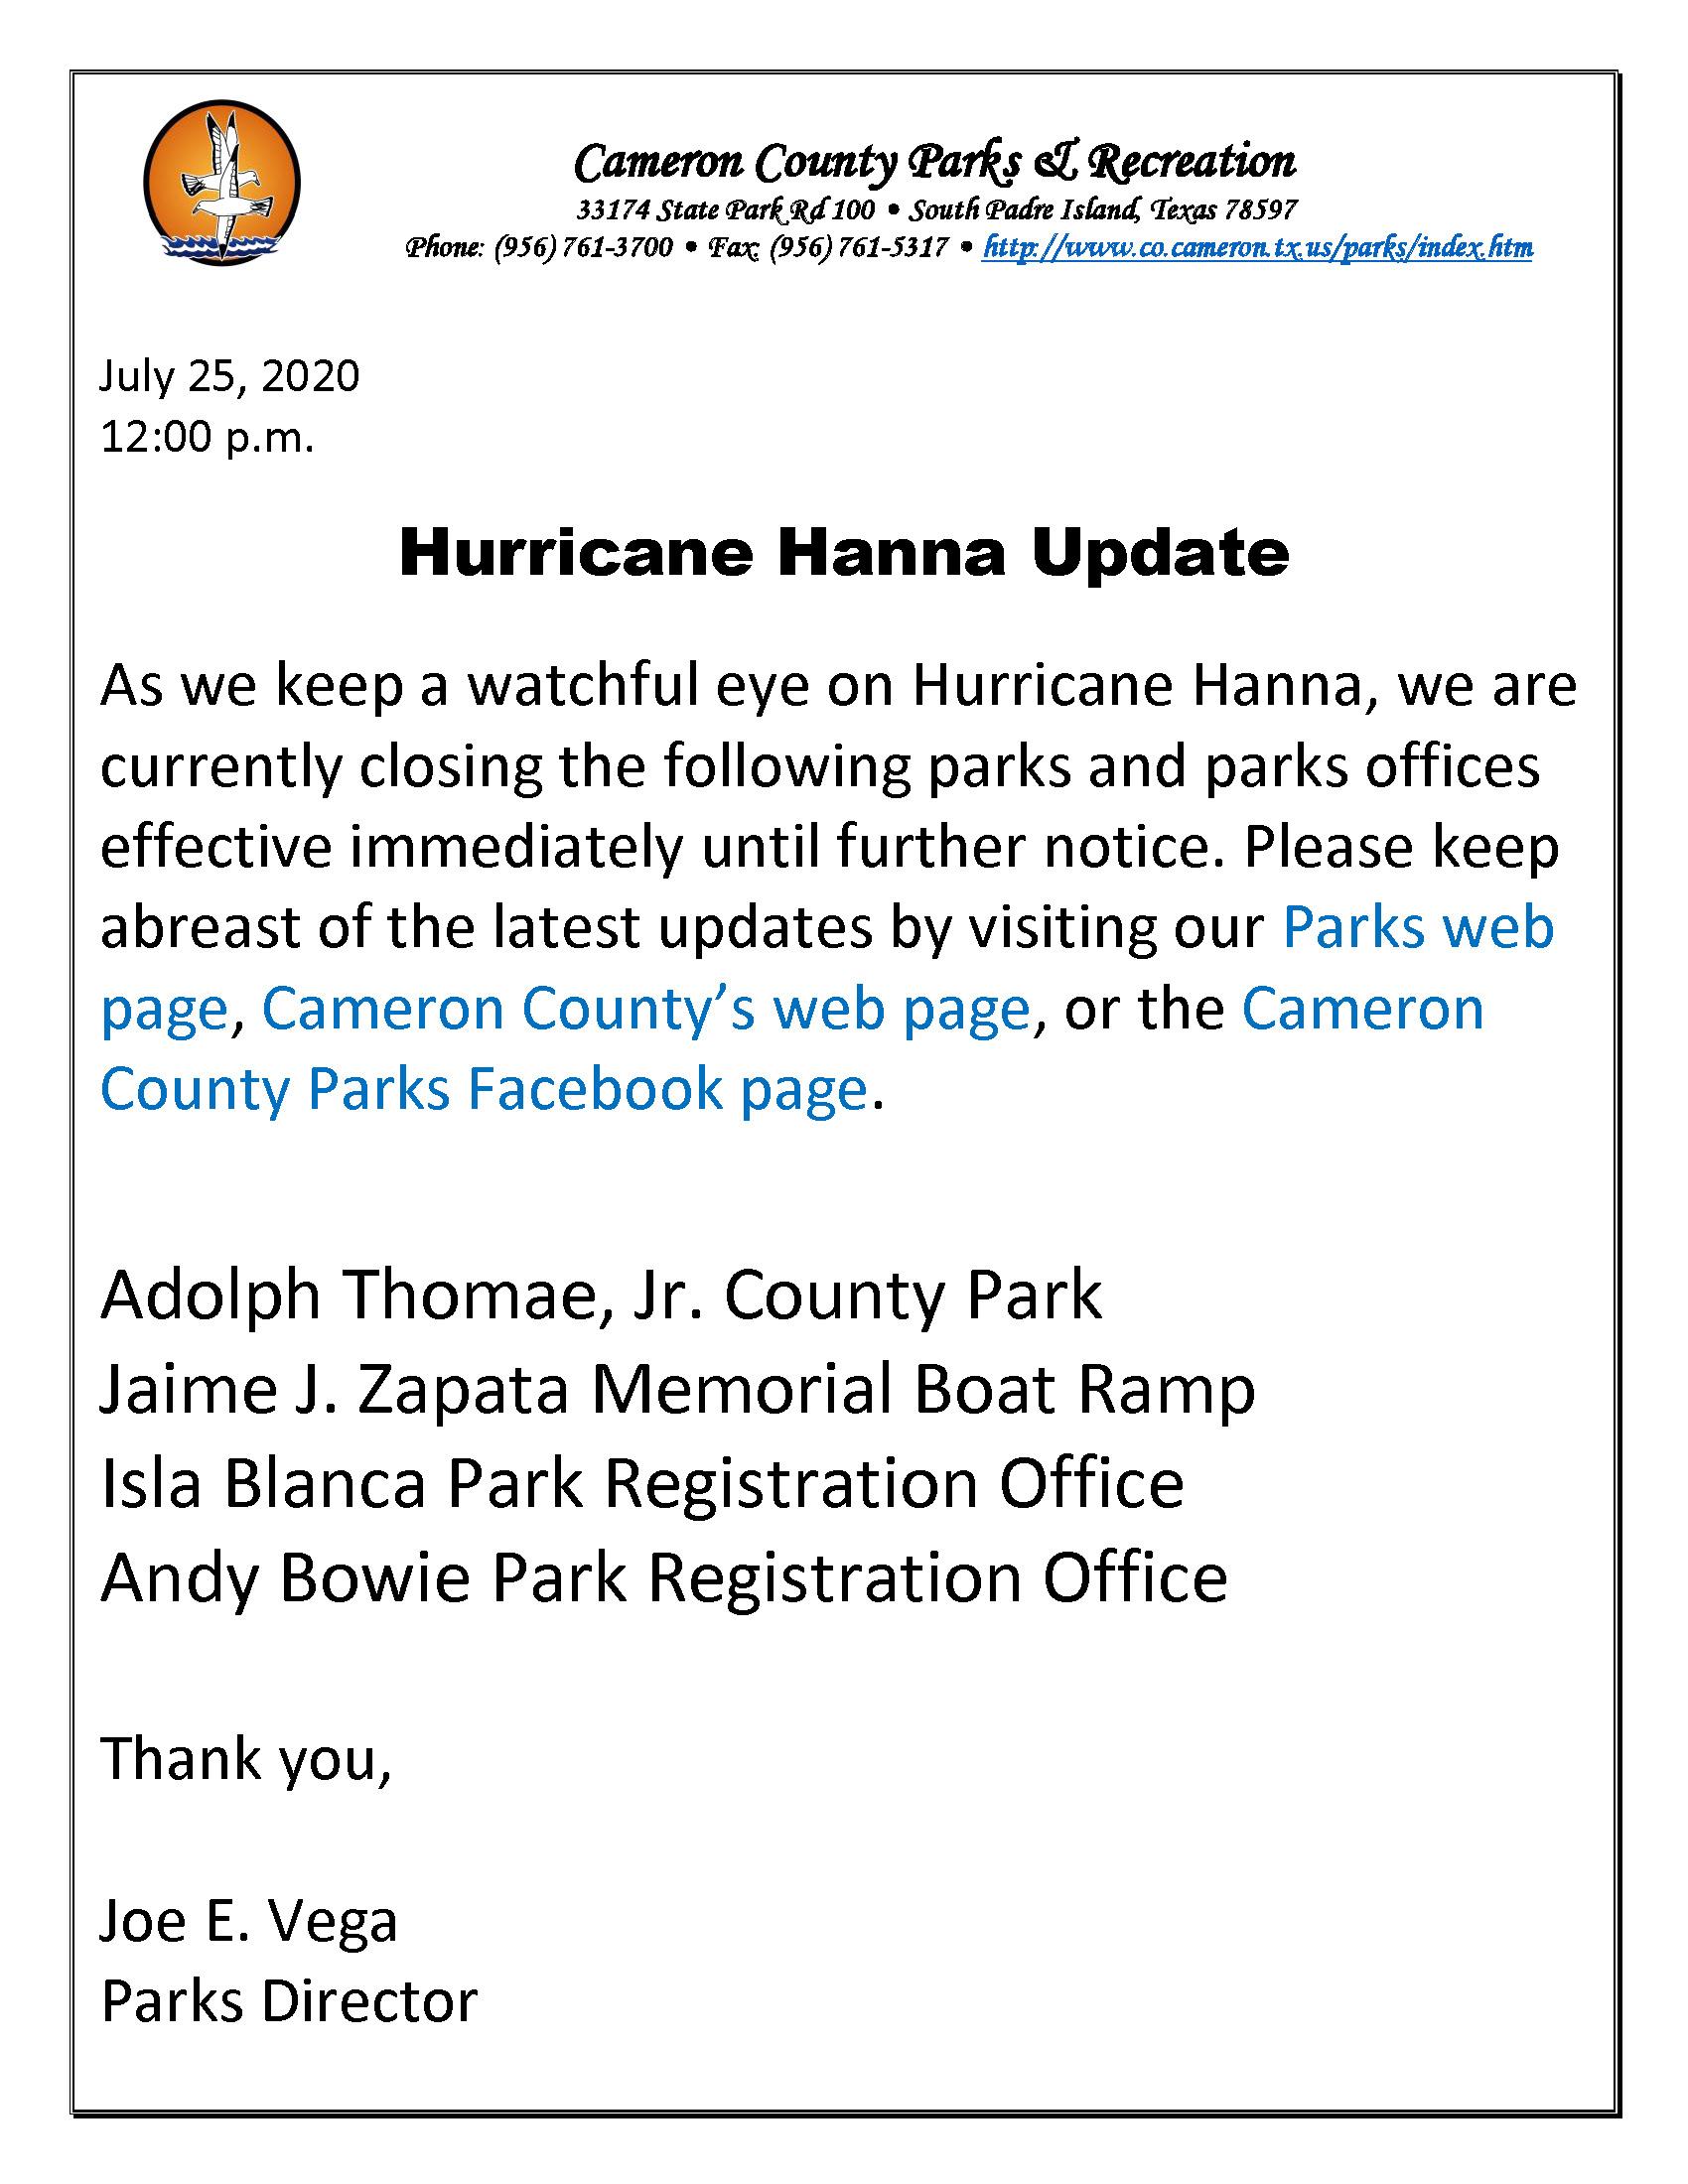 ADVISORY On Closing Parks And Parks Office Hurricane Hanna 7 25 20